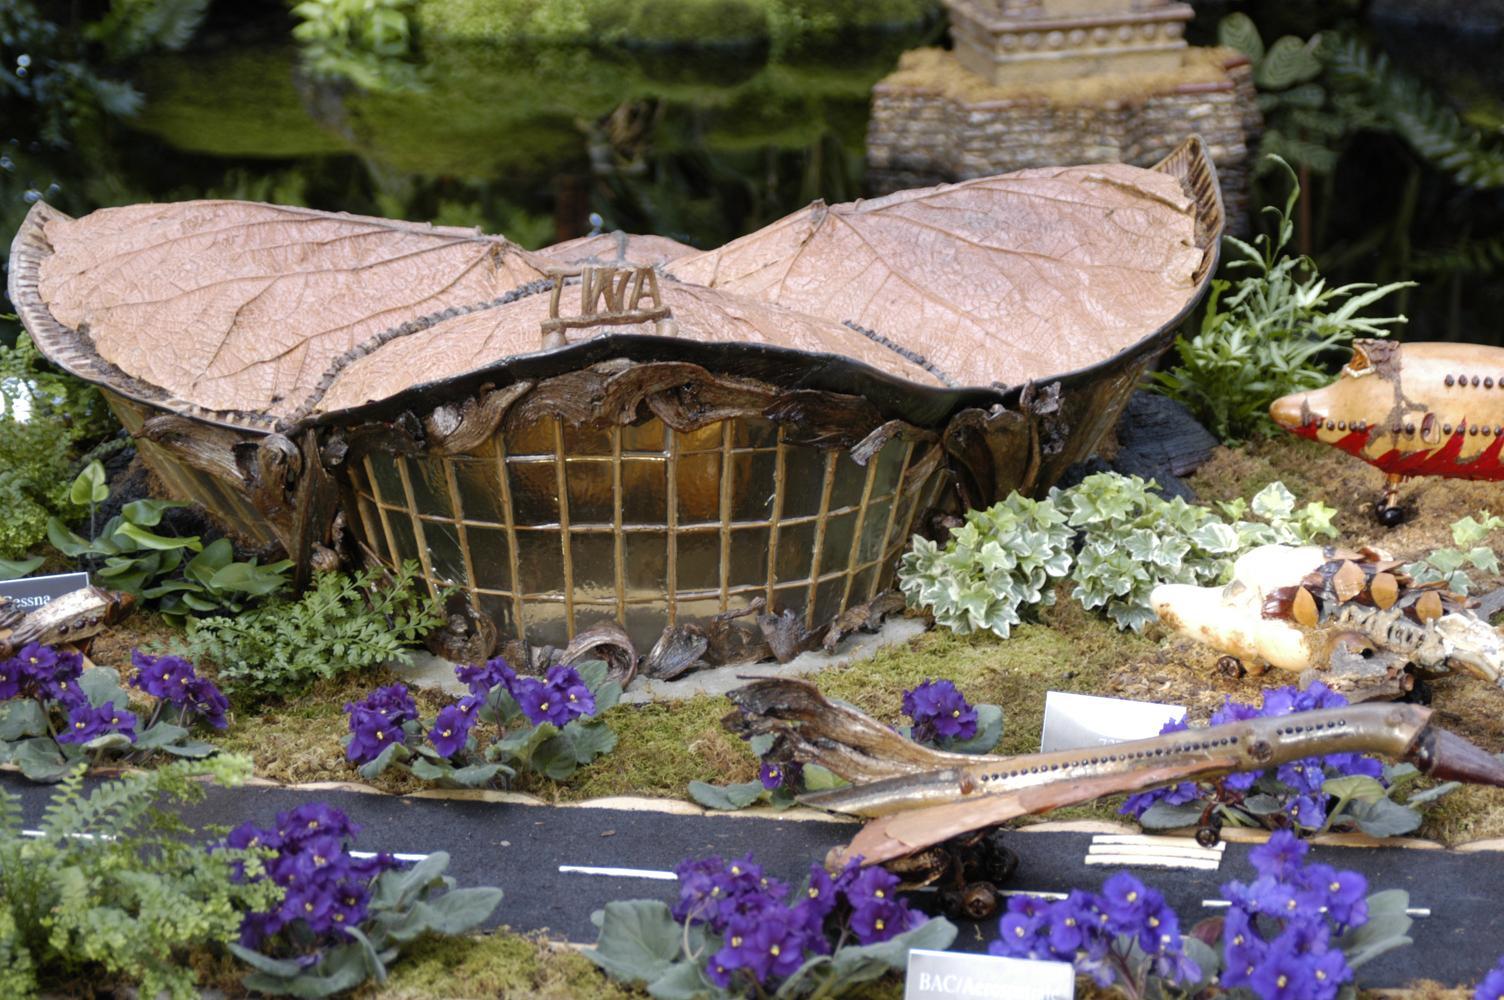 Botanical Garden Train Show, Bronx NY – Once Upon a Paradigm